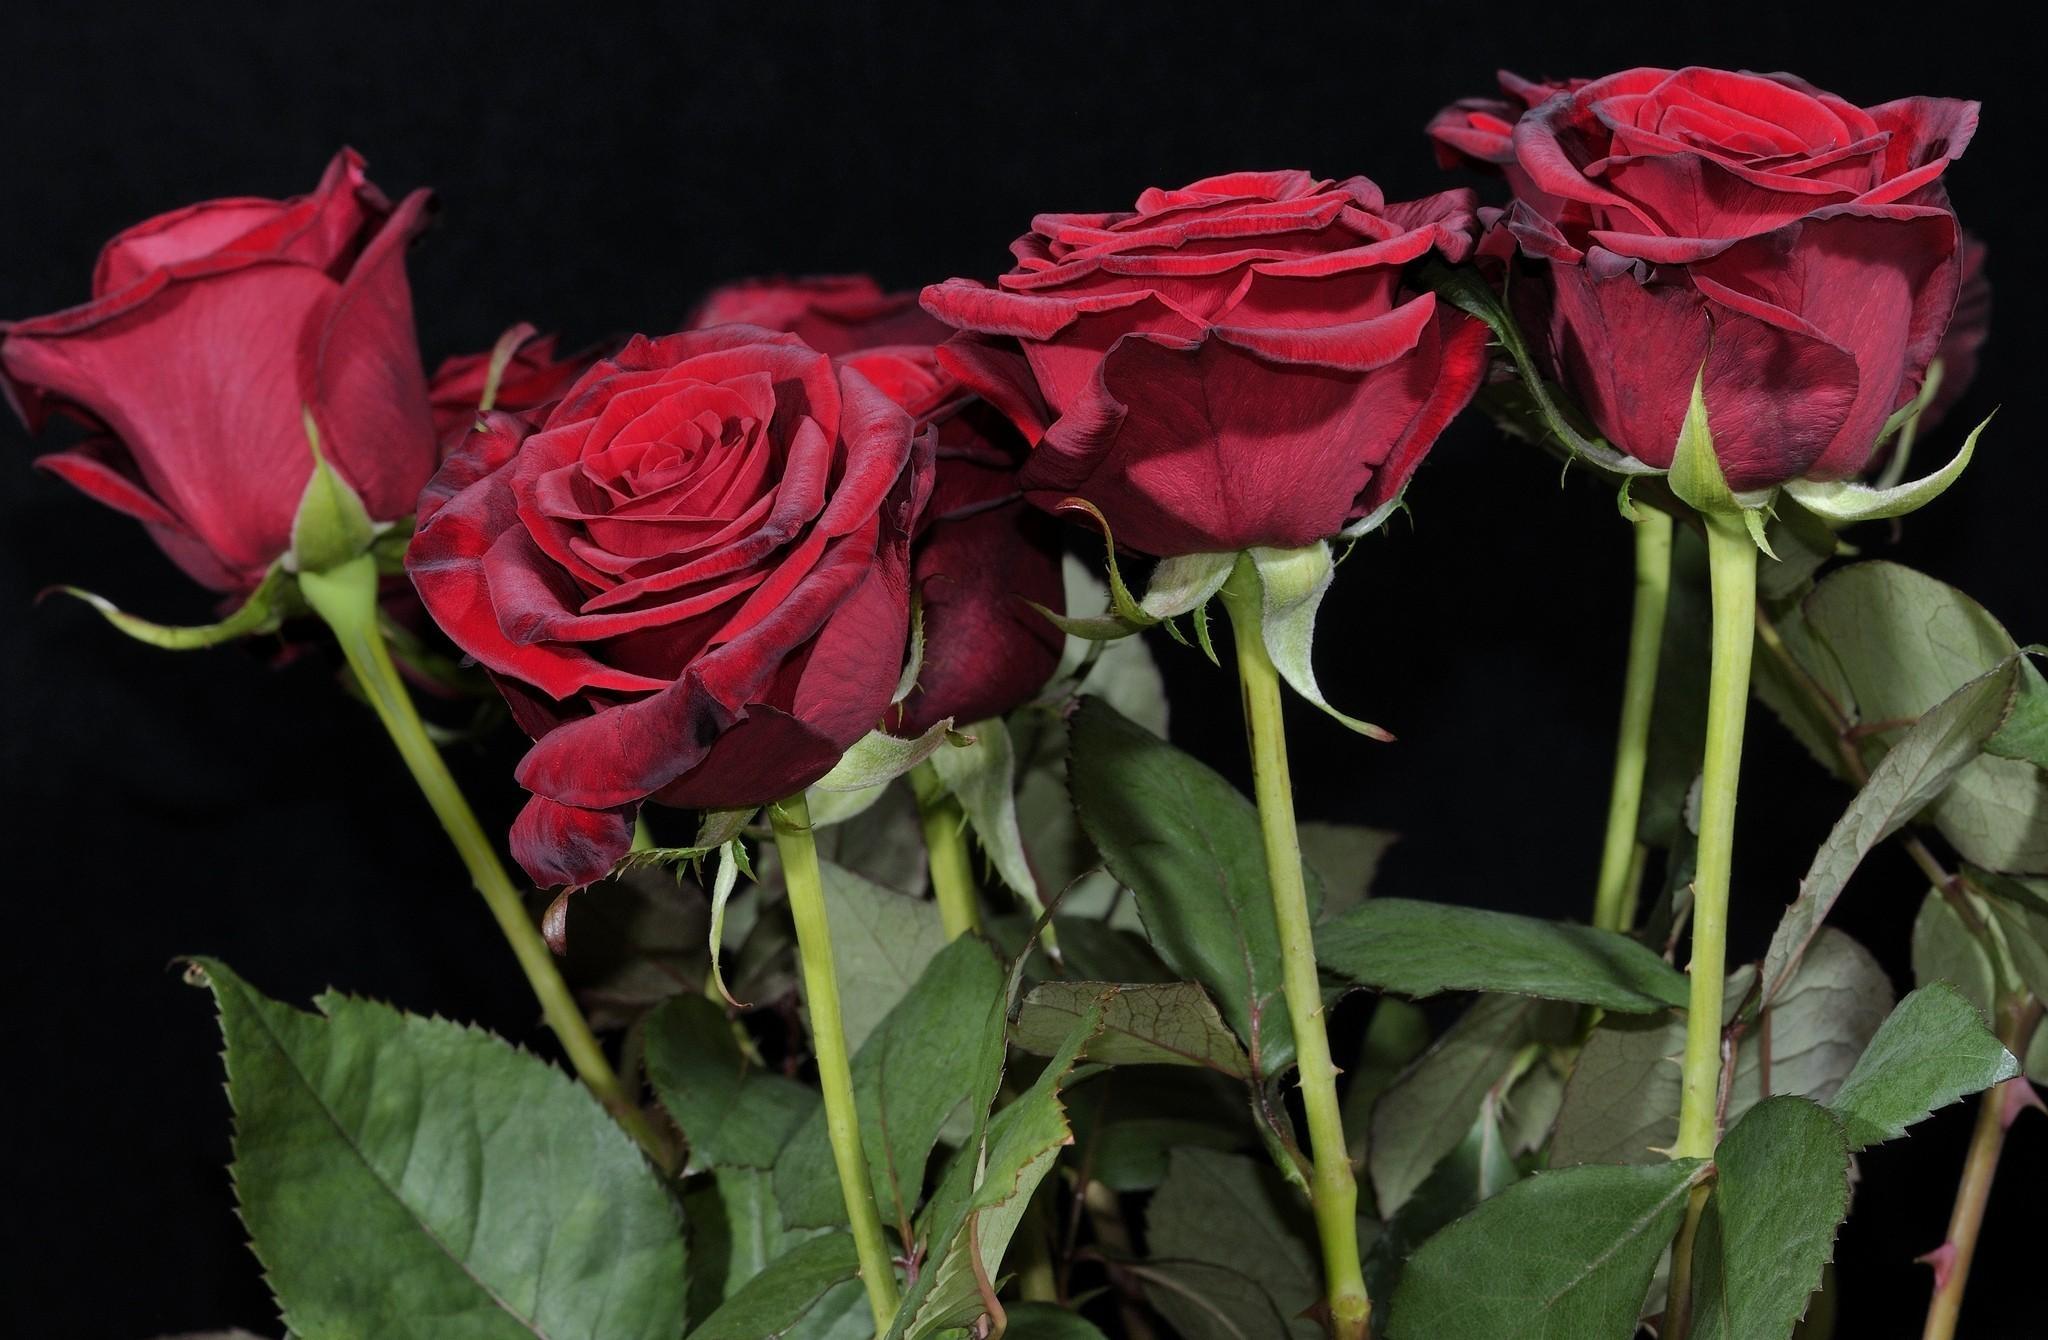 Wallpaper Mawar Merah Bunga Latar Belakang Hitam 2048x1340